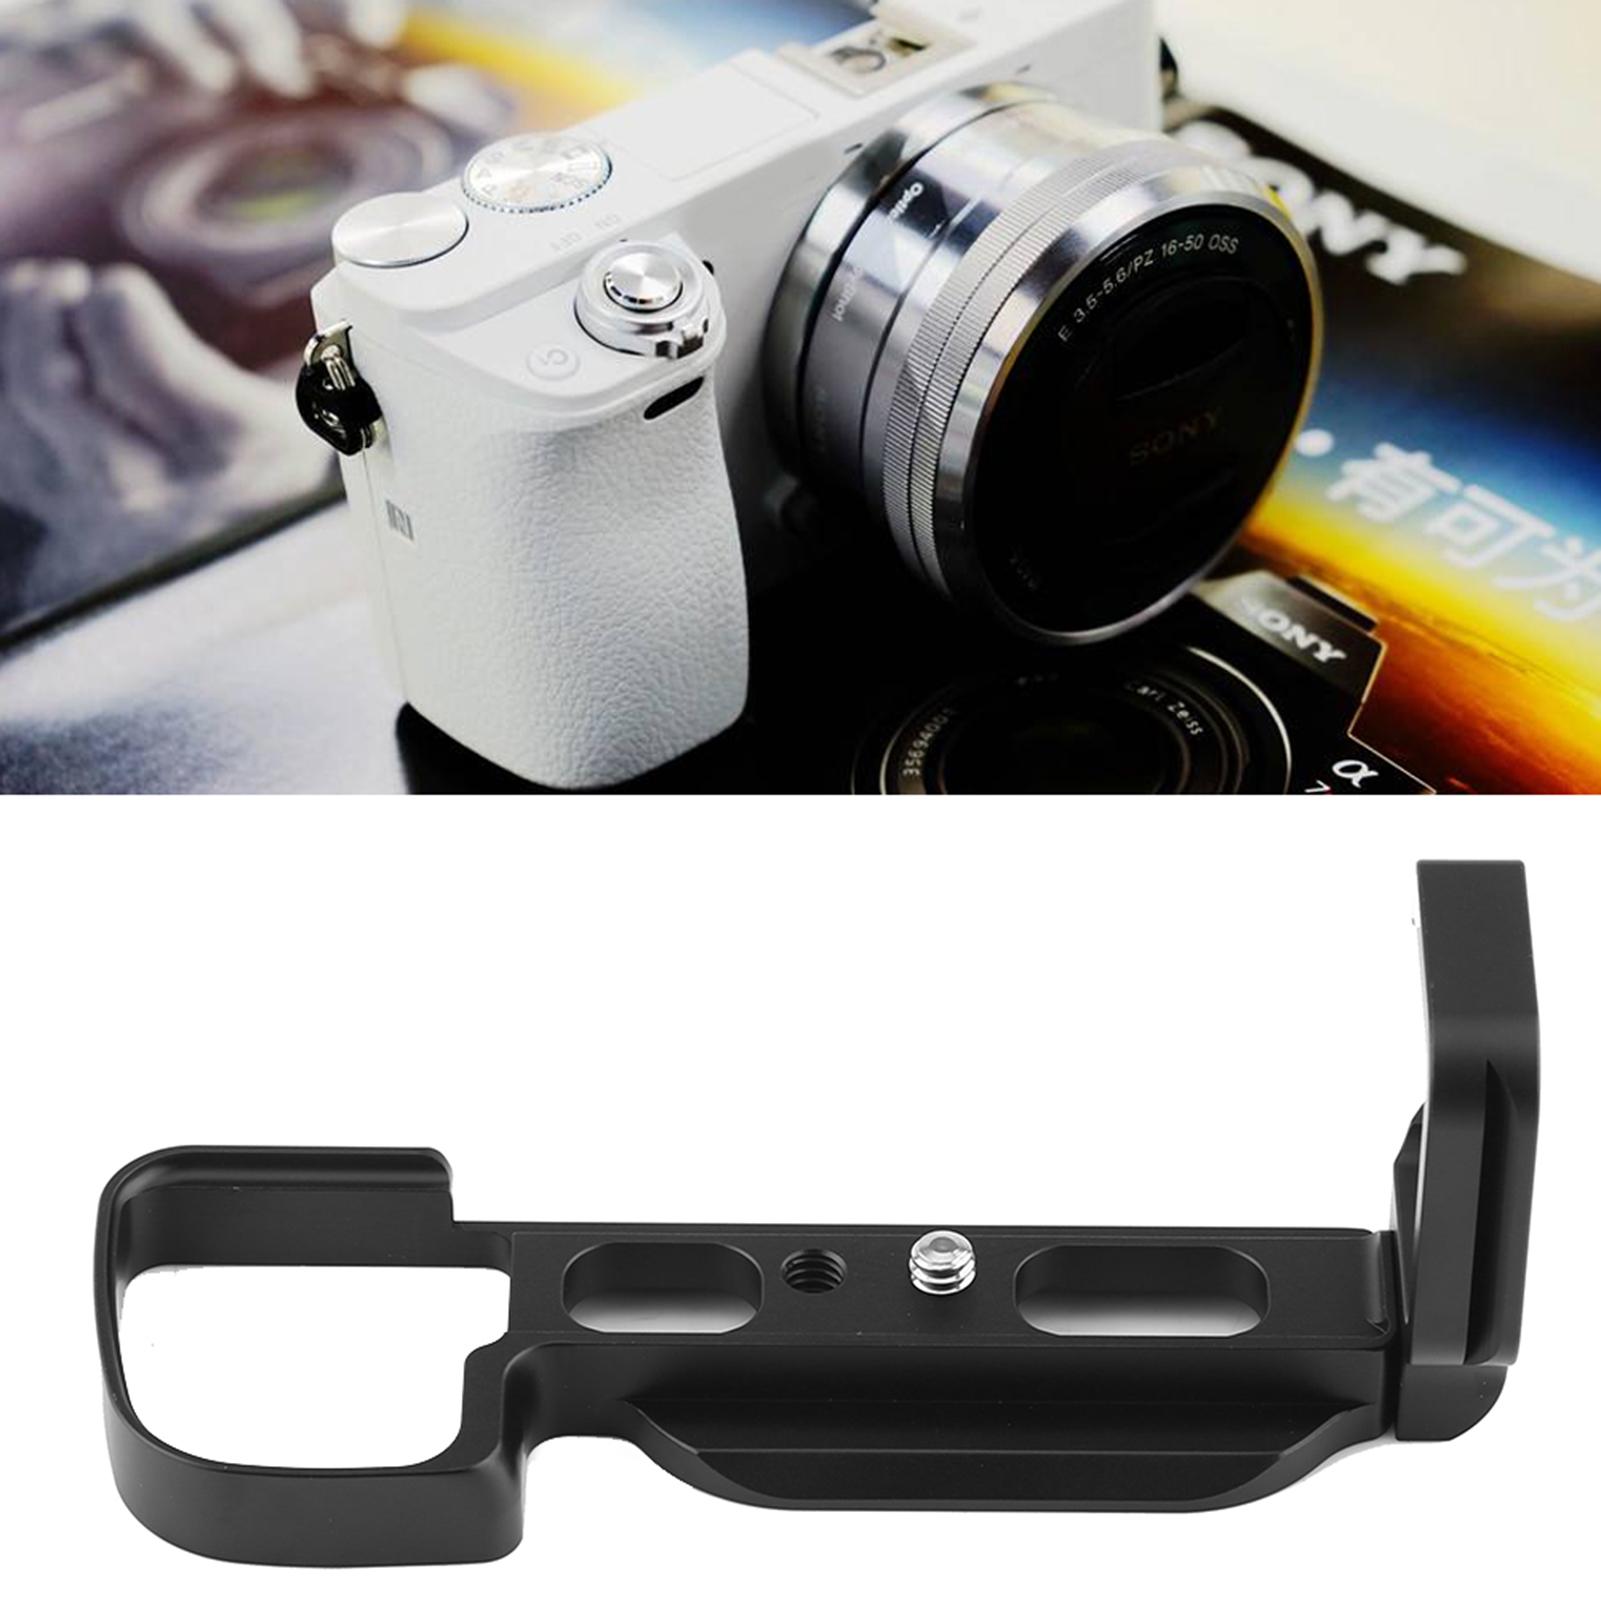 Quick Release Holder L Plate Vertival Bracket Grip For Sony A6000 Kamera Alpha Image